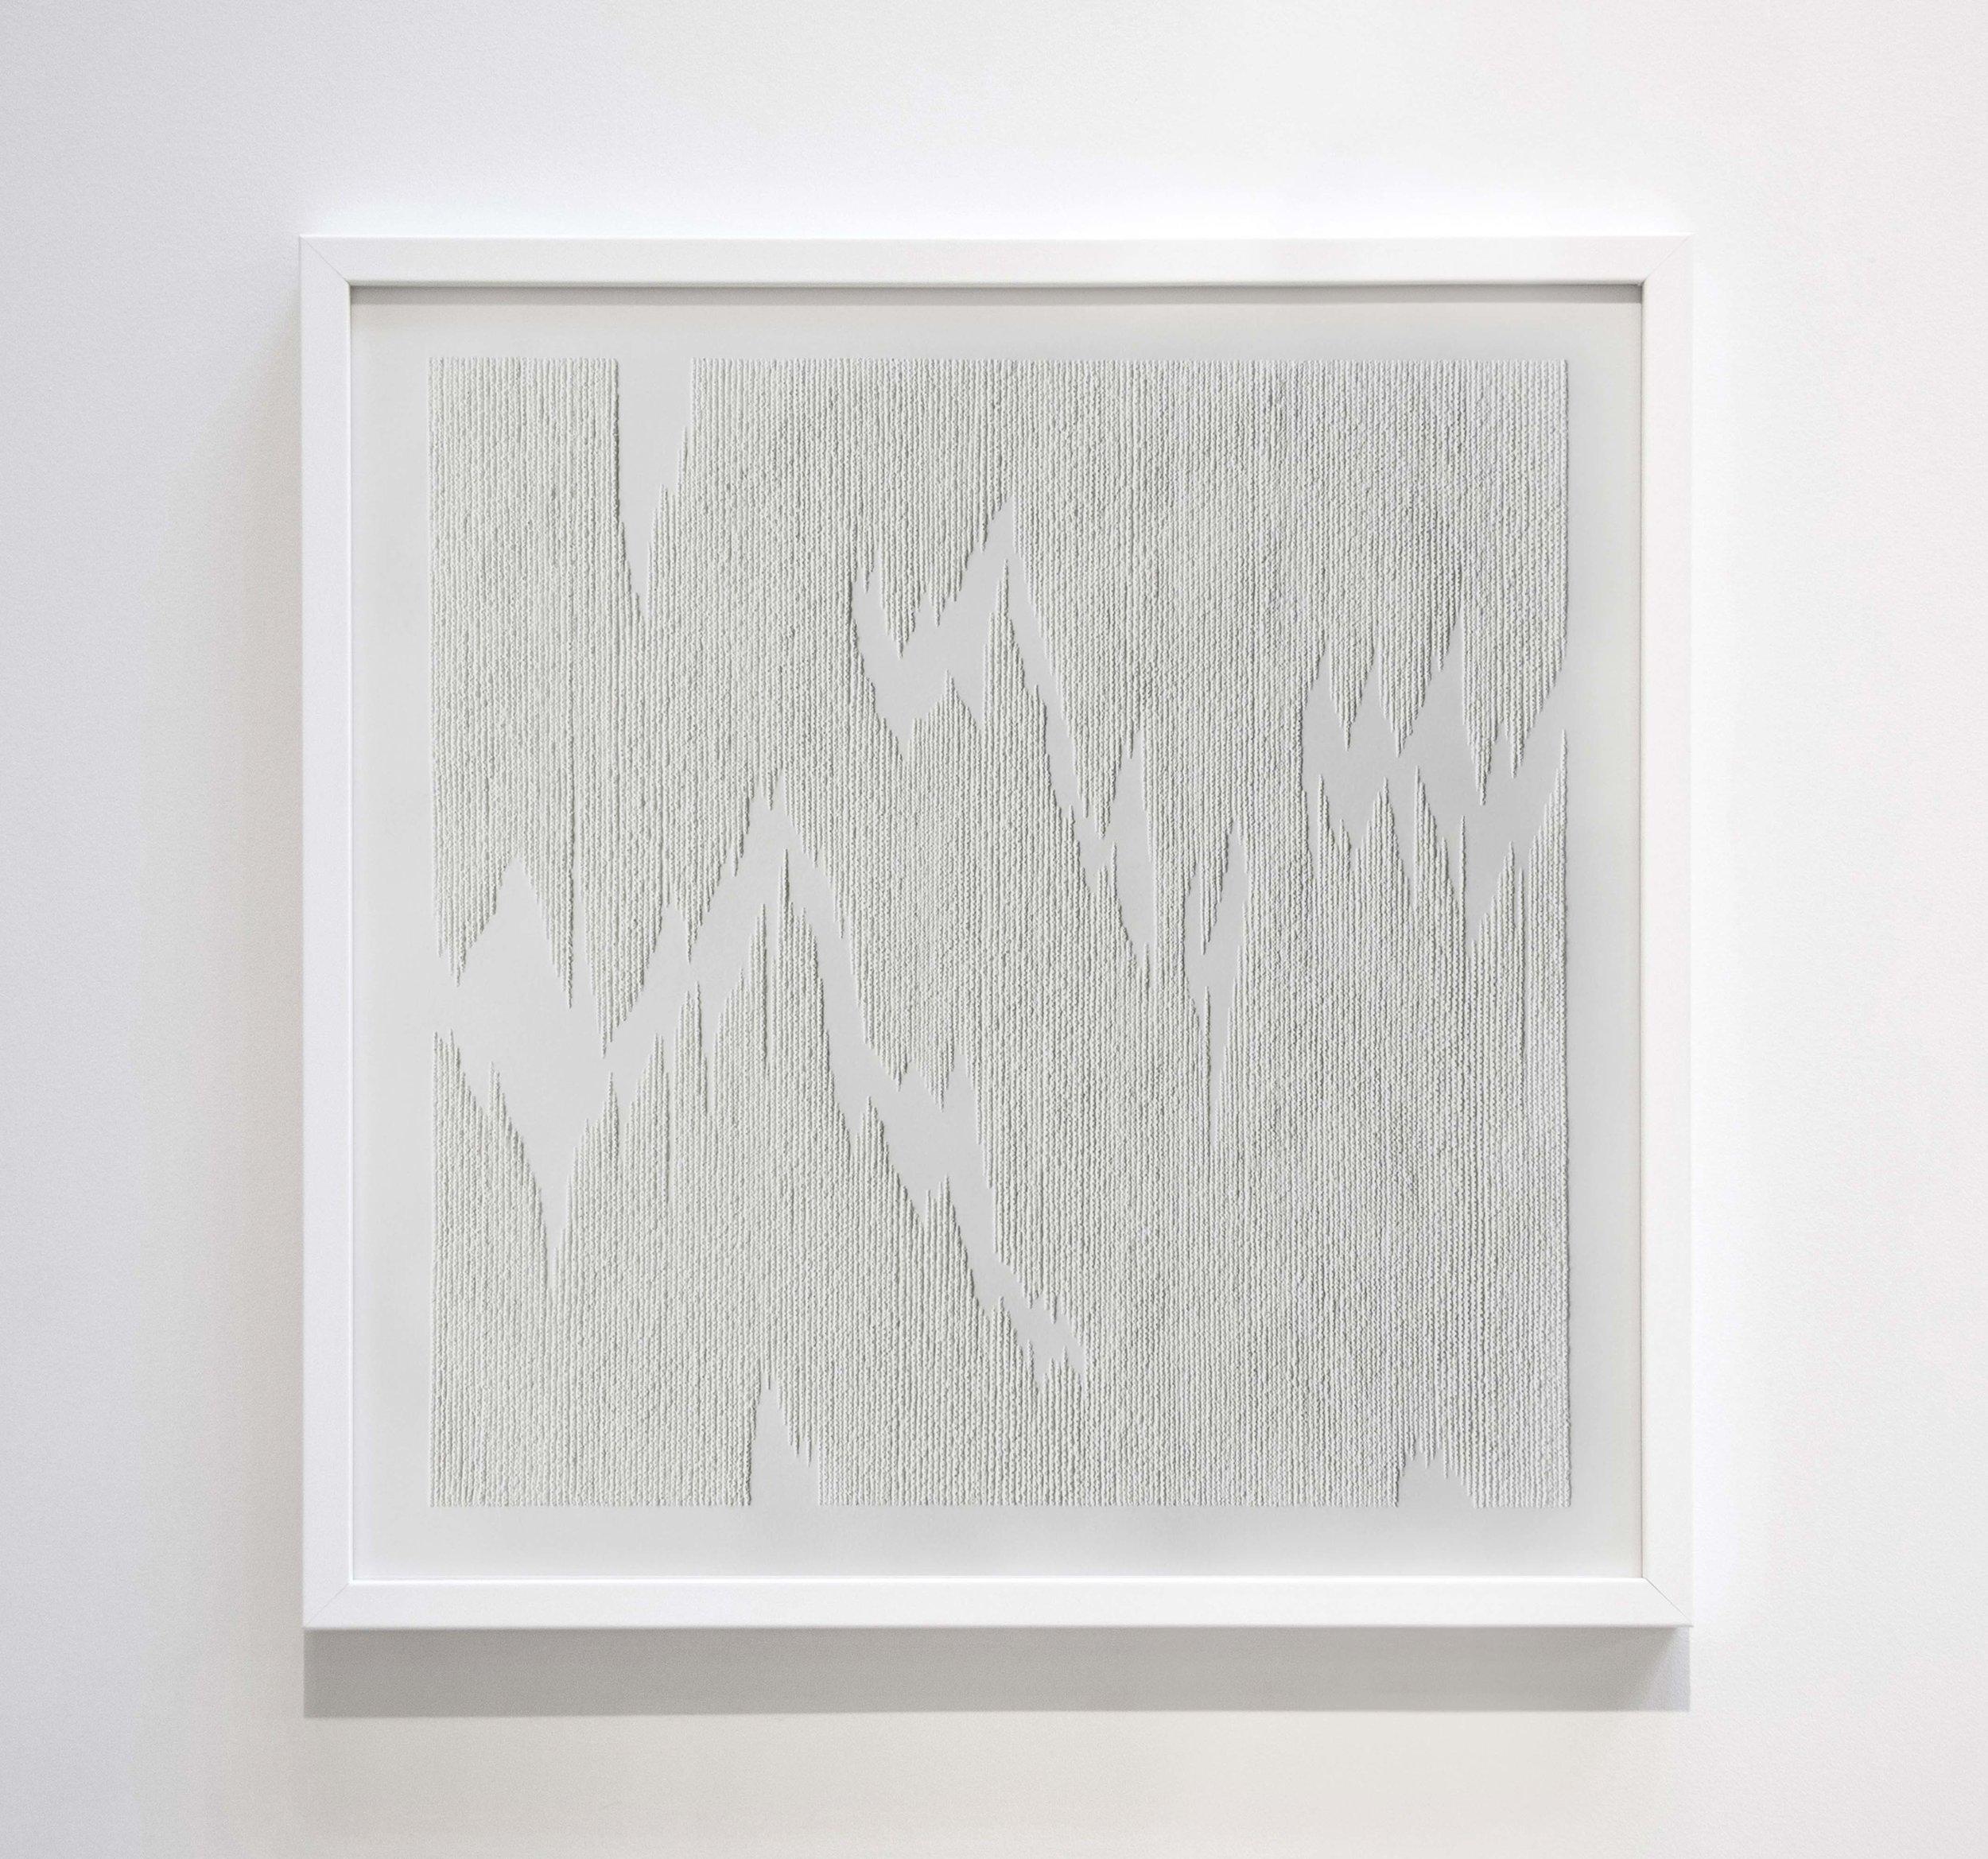 Antonin_Anzil-Square-3-vue2-low.jpg